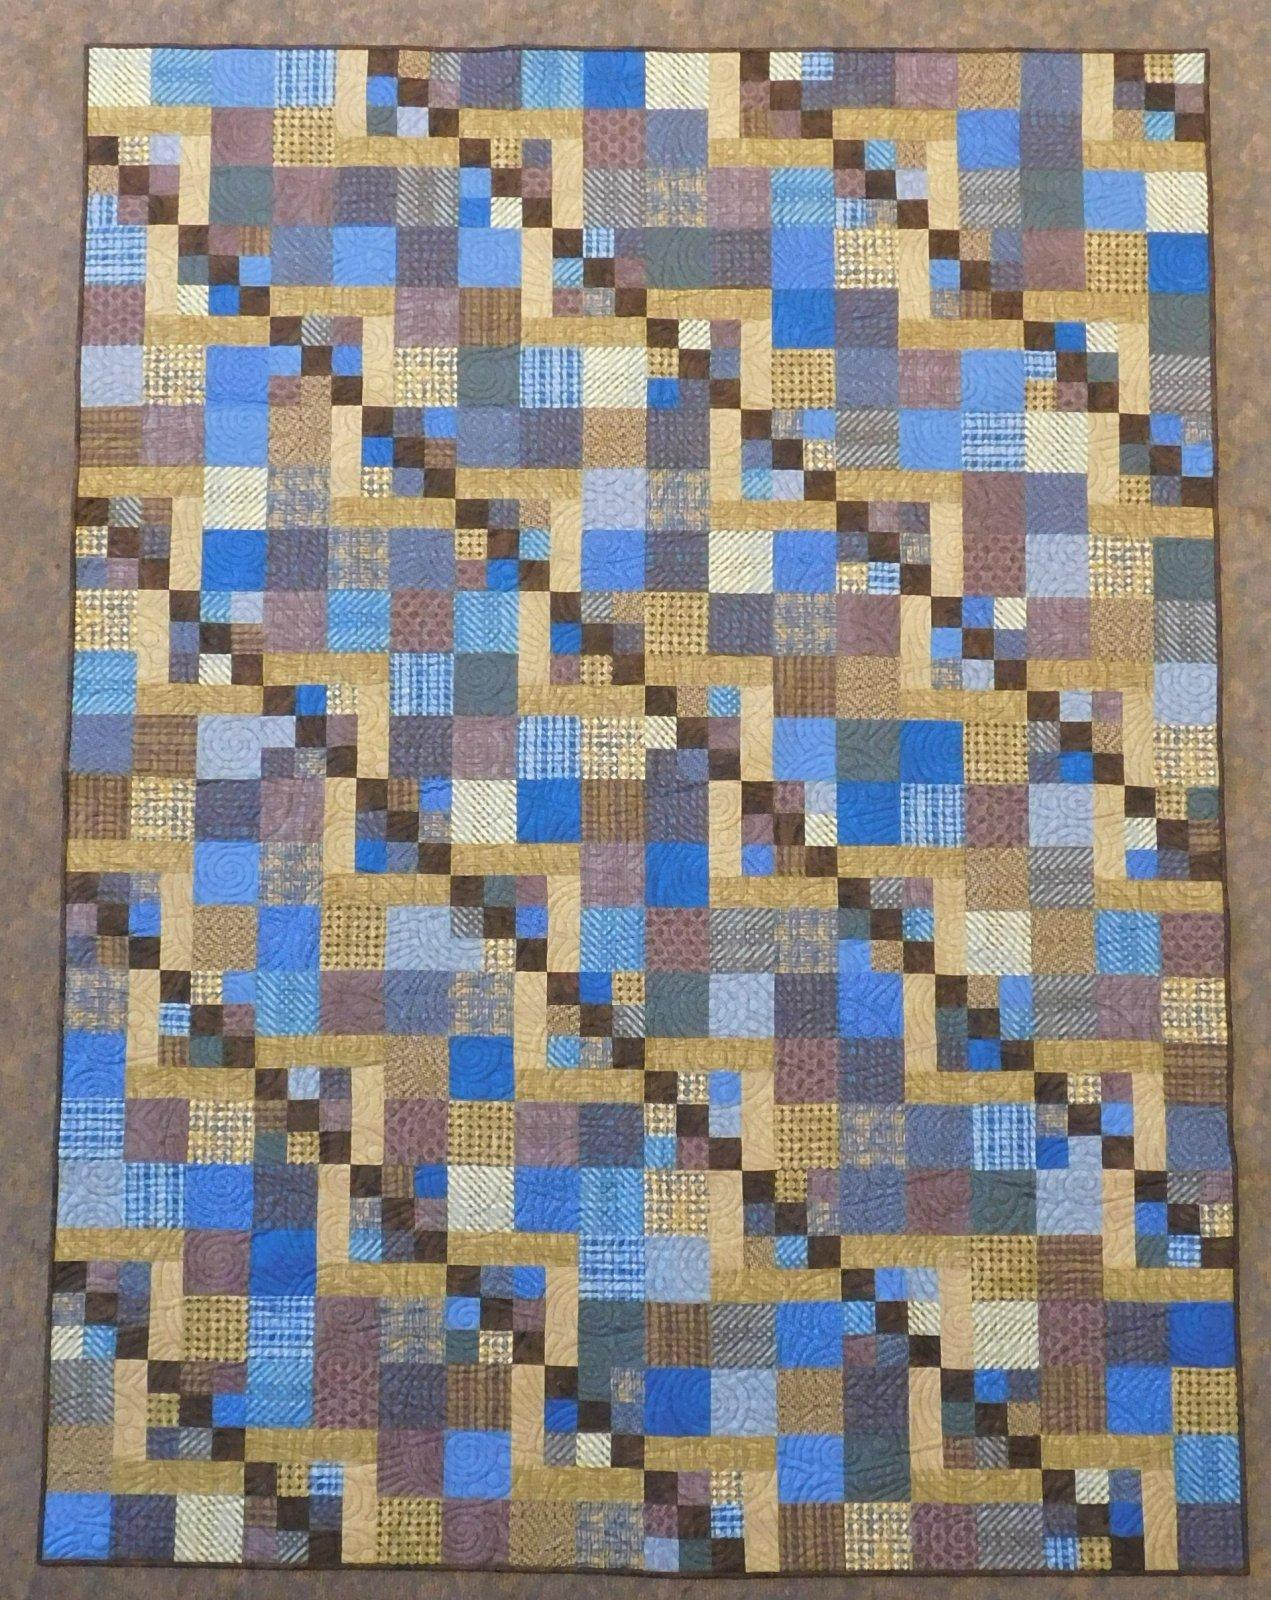 Pottery Quilt Kit 72 x 96